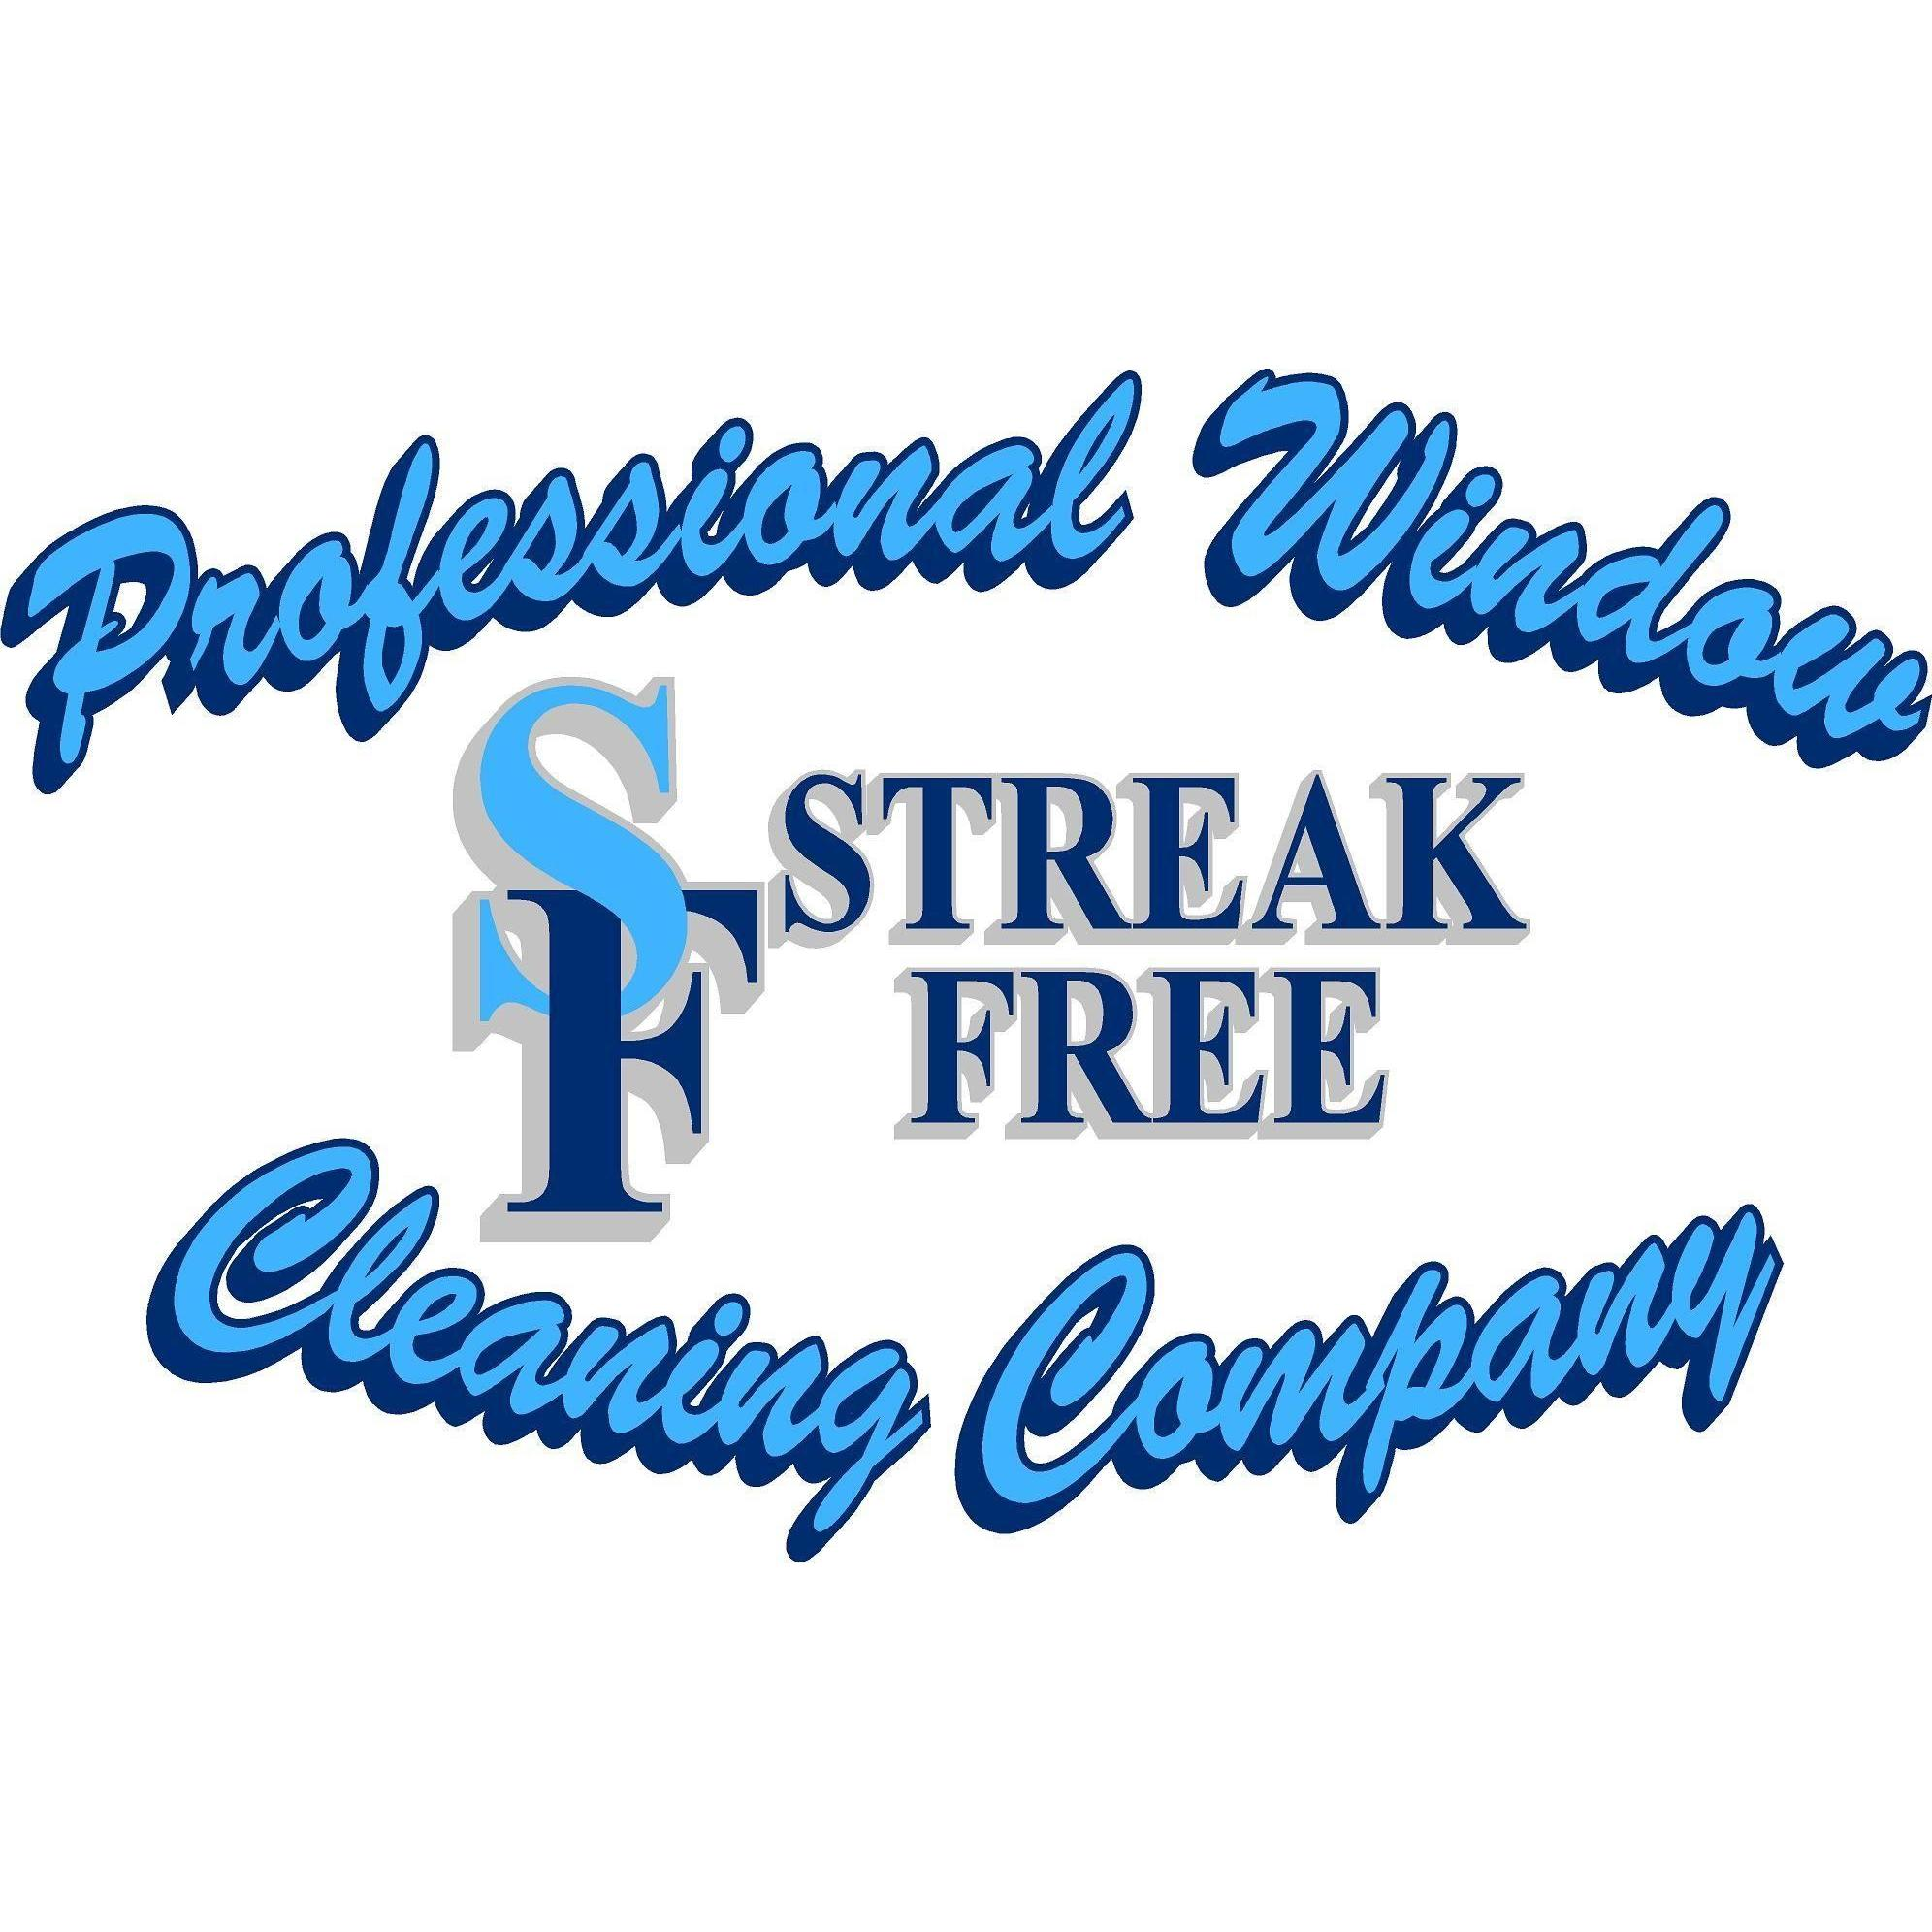 Streak Free Professional Window Cleaning Company